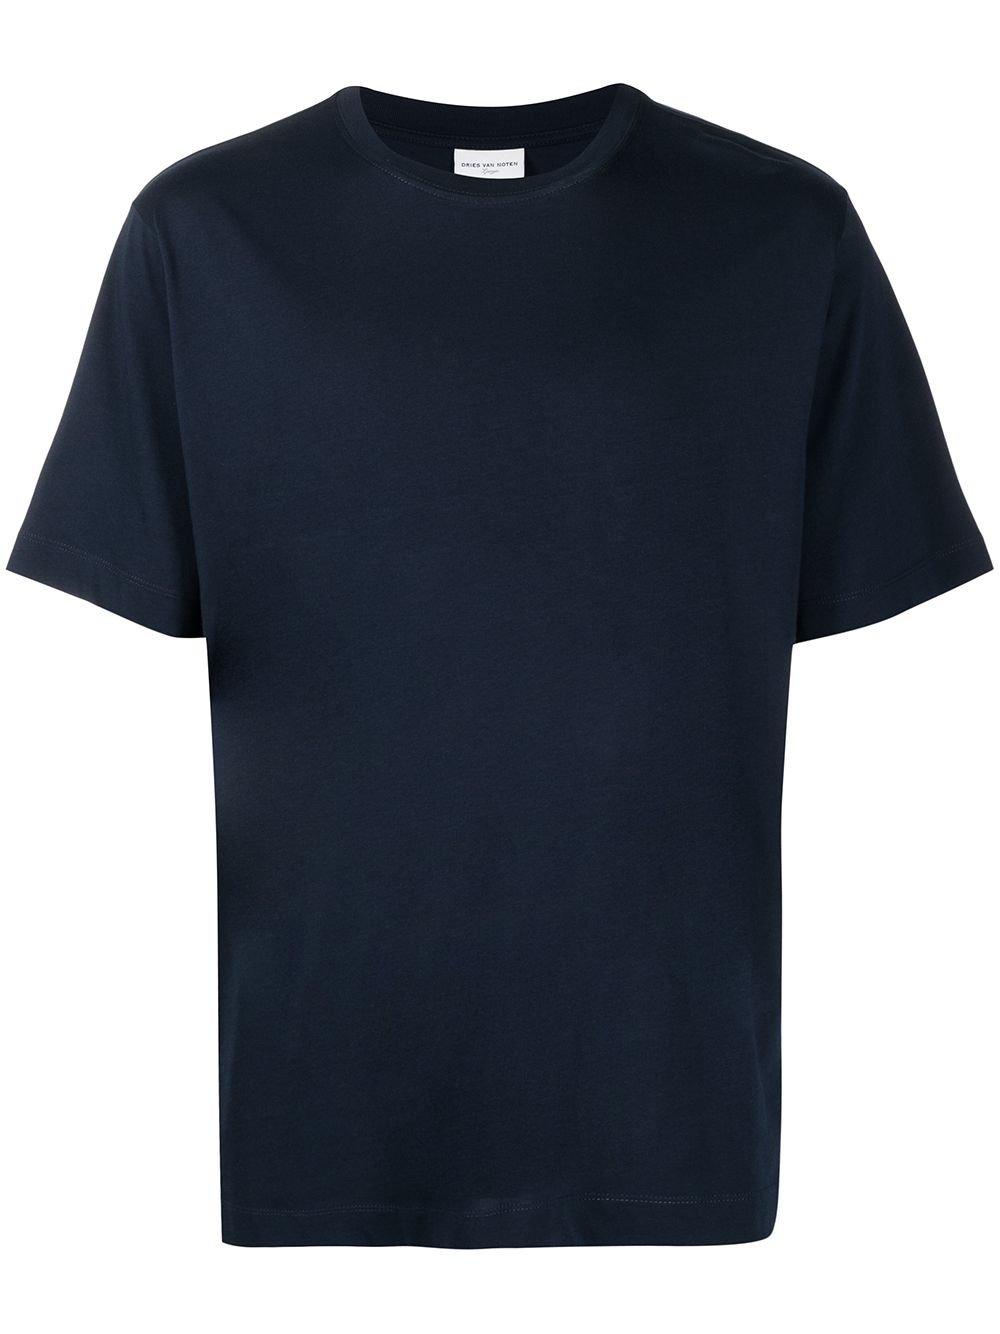 BASIC T-SHIRT DRIES VAN NOTEN | T-shirts | HEEB2600NAVY